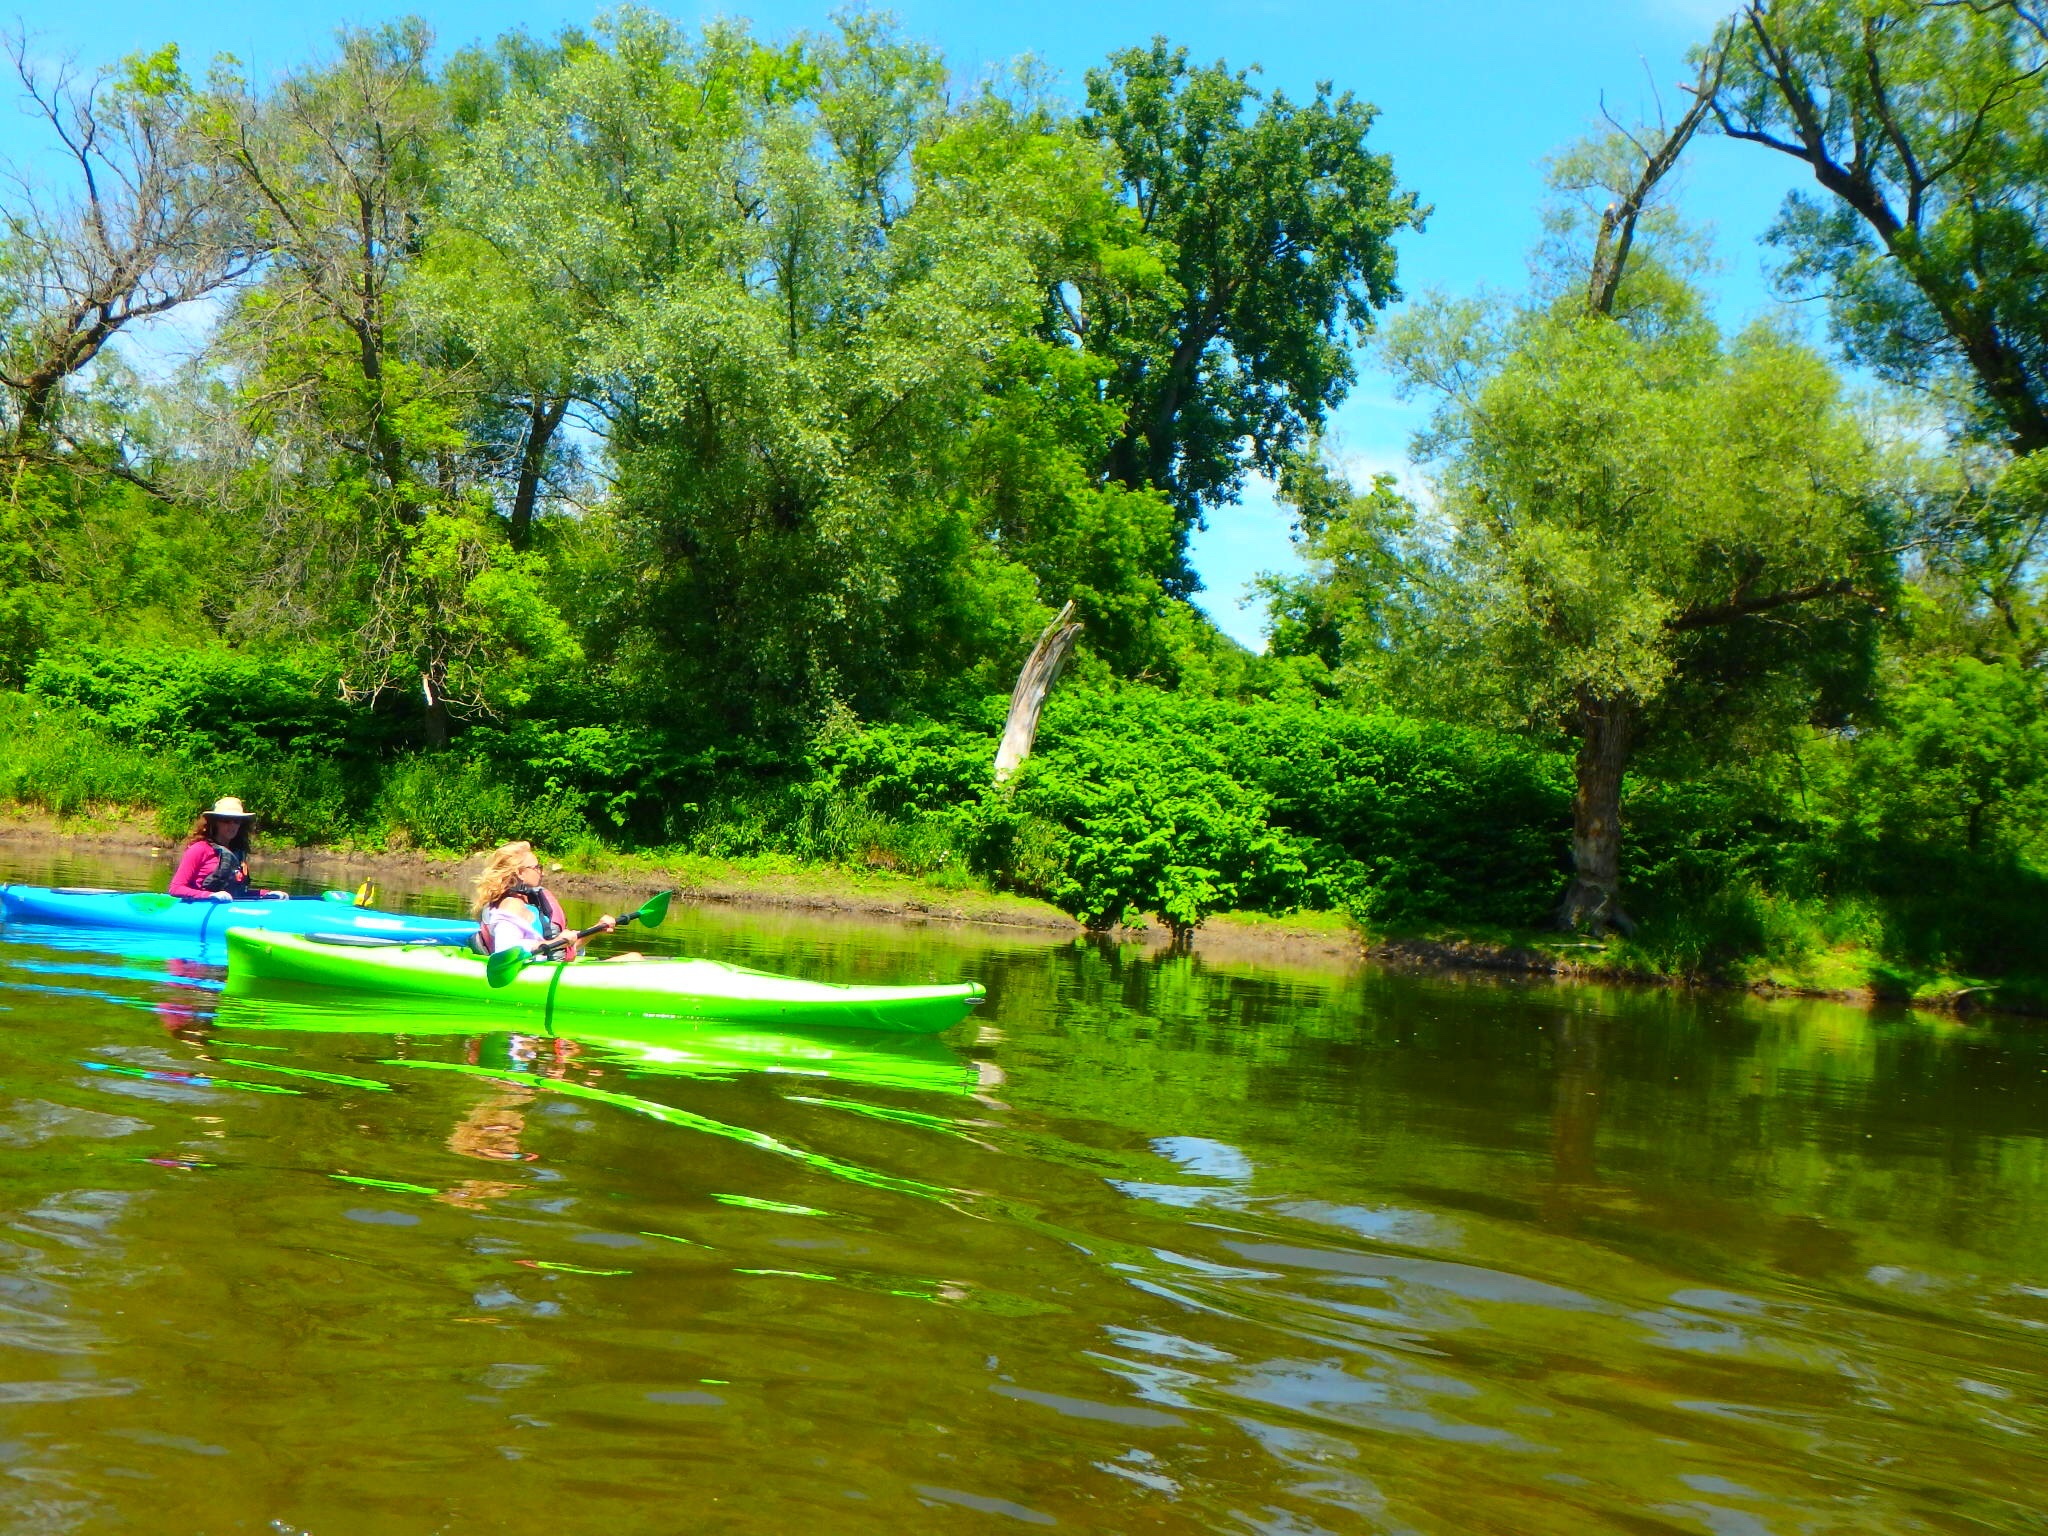 Kayaking Yoga Meditation - Solstice - Jun 21 2018-64